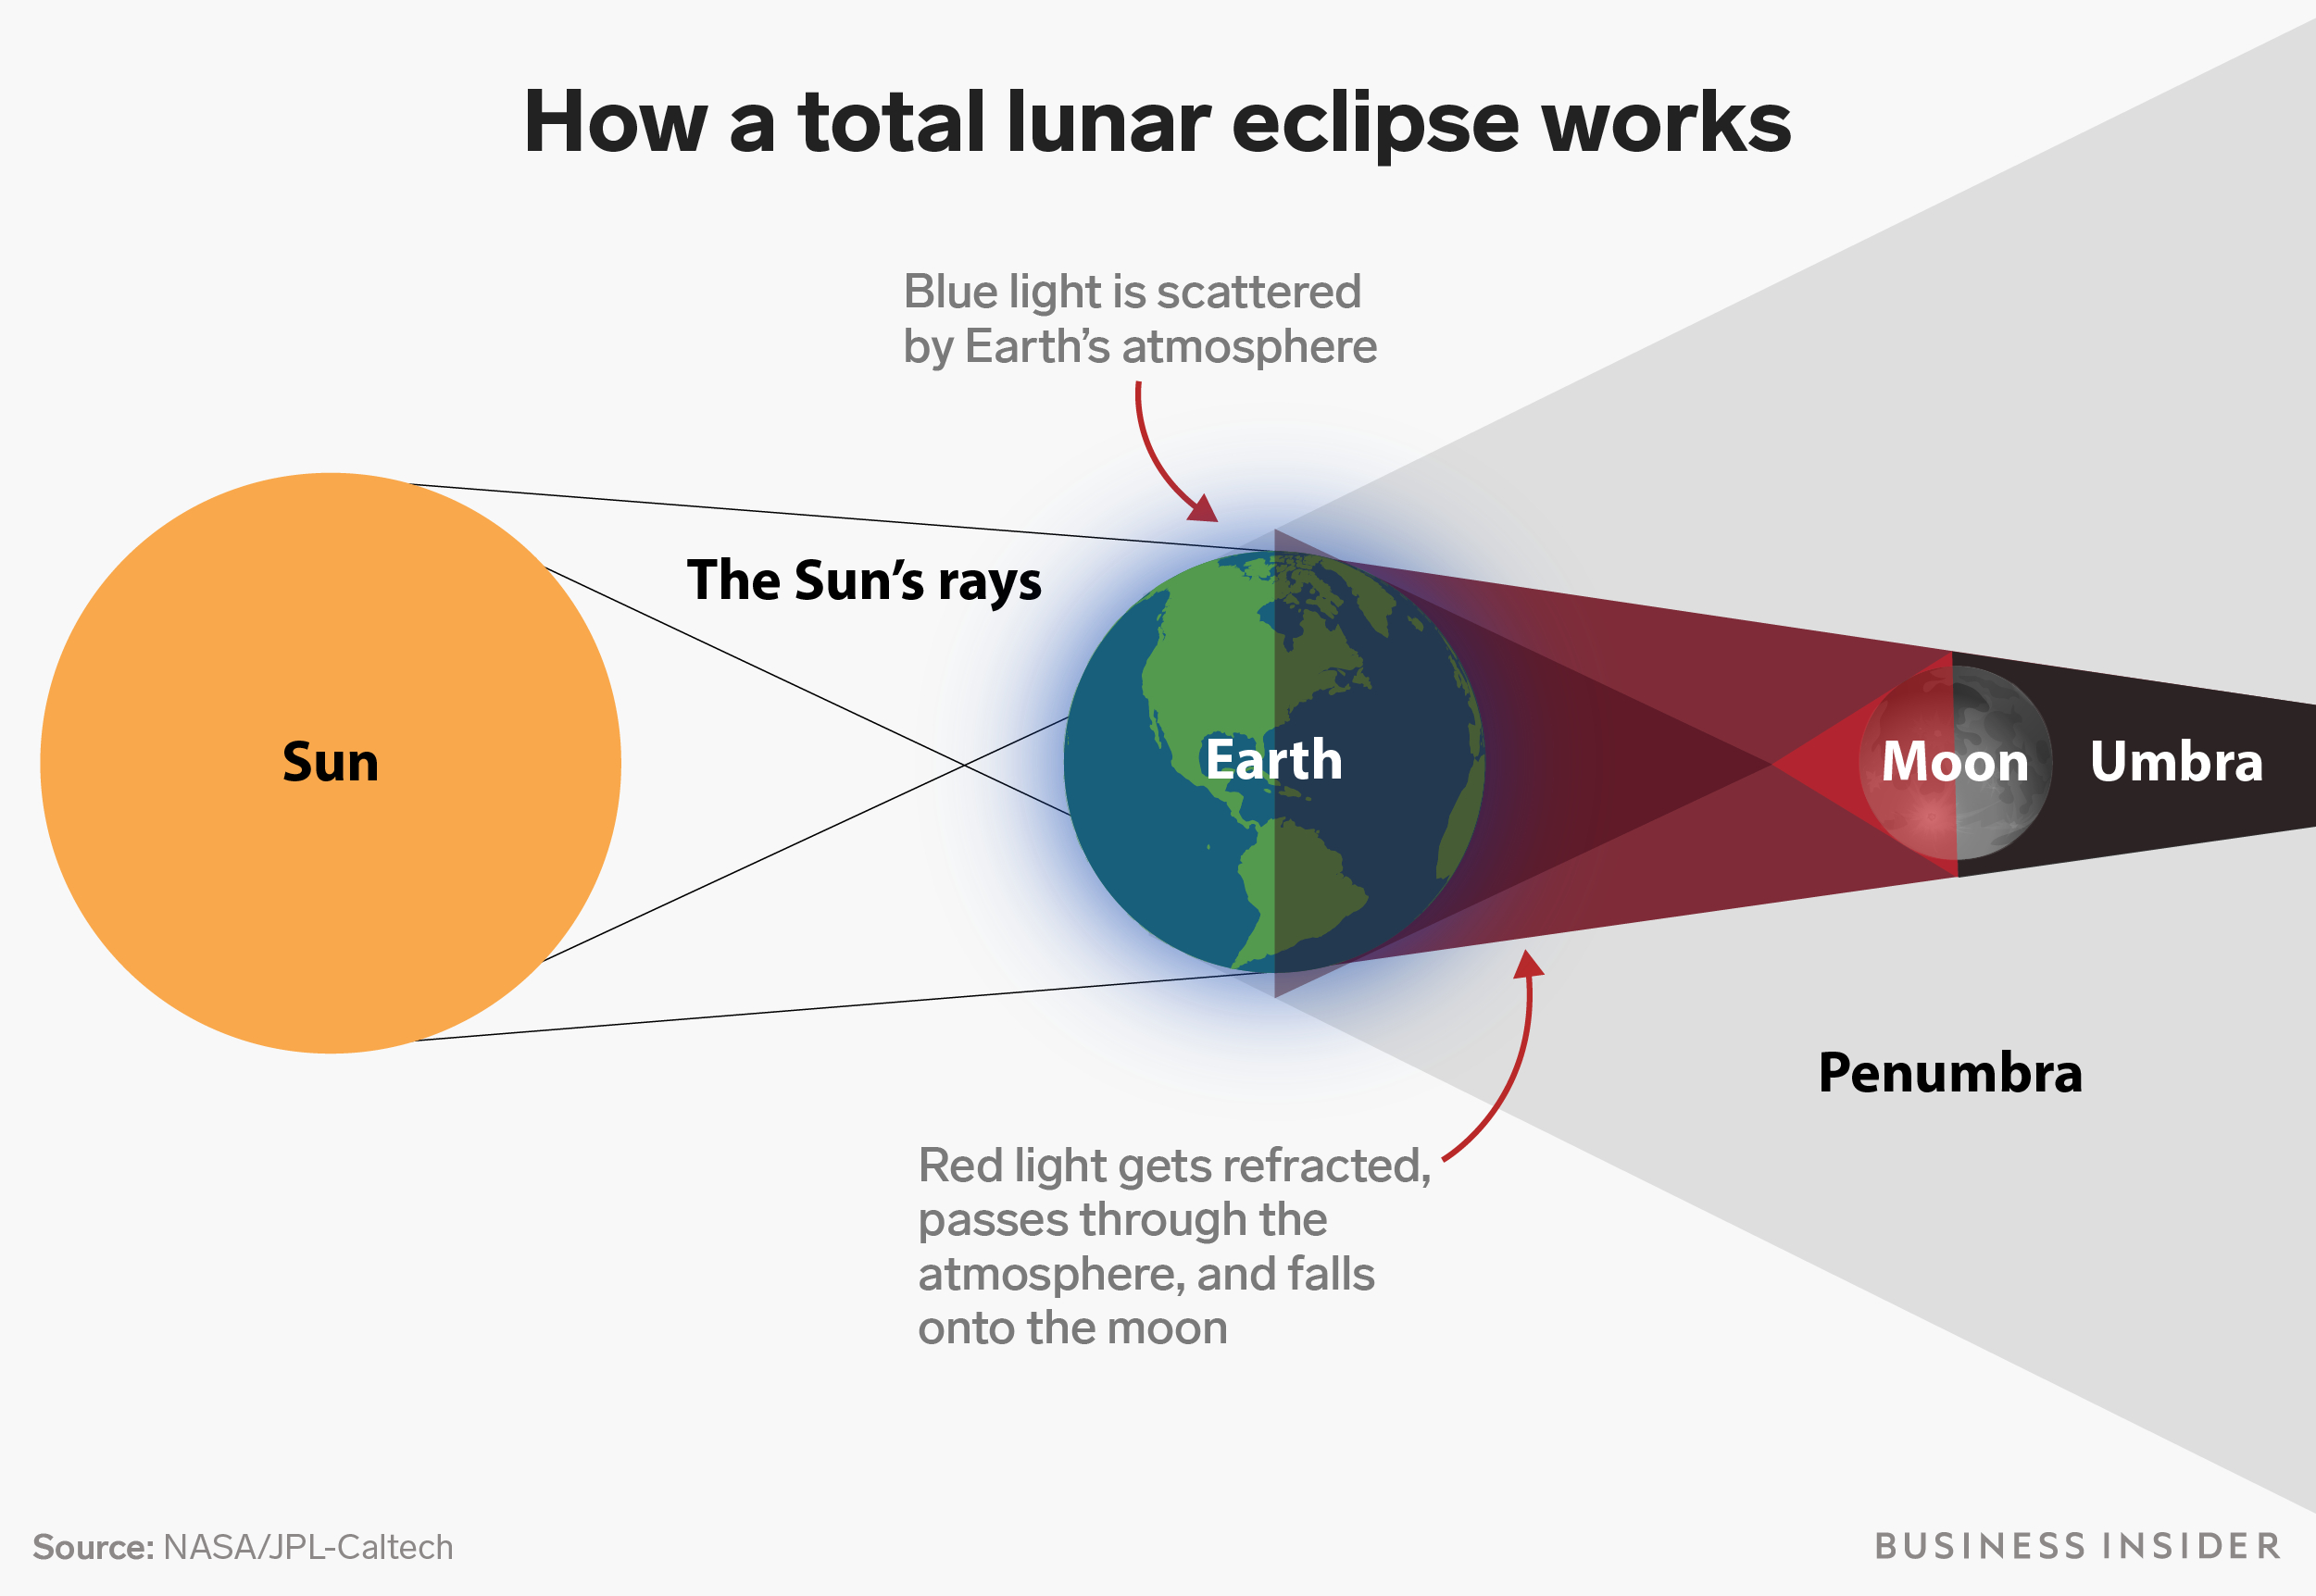 Solar Eclipse Diagram The Longest Total Lunar Eclipse In A Century Happens This Week